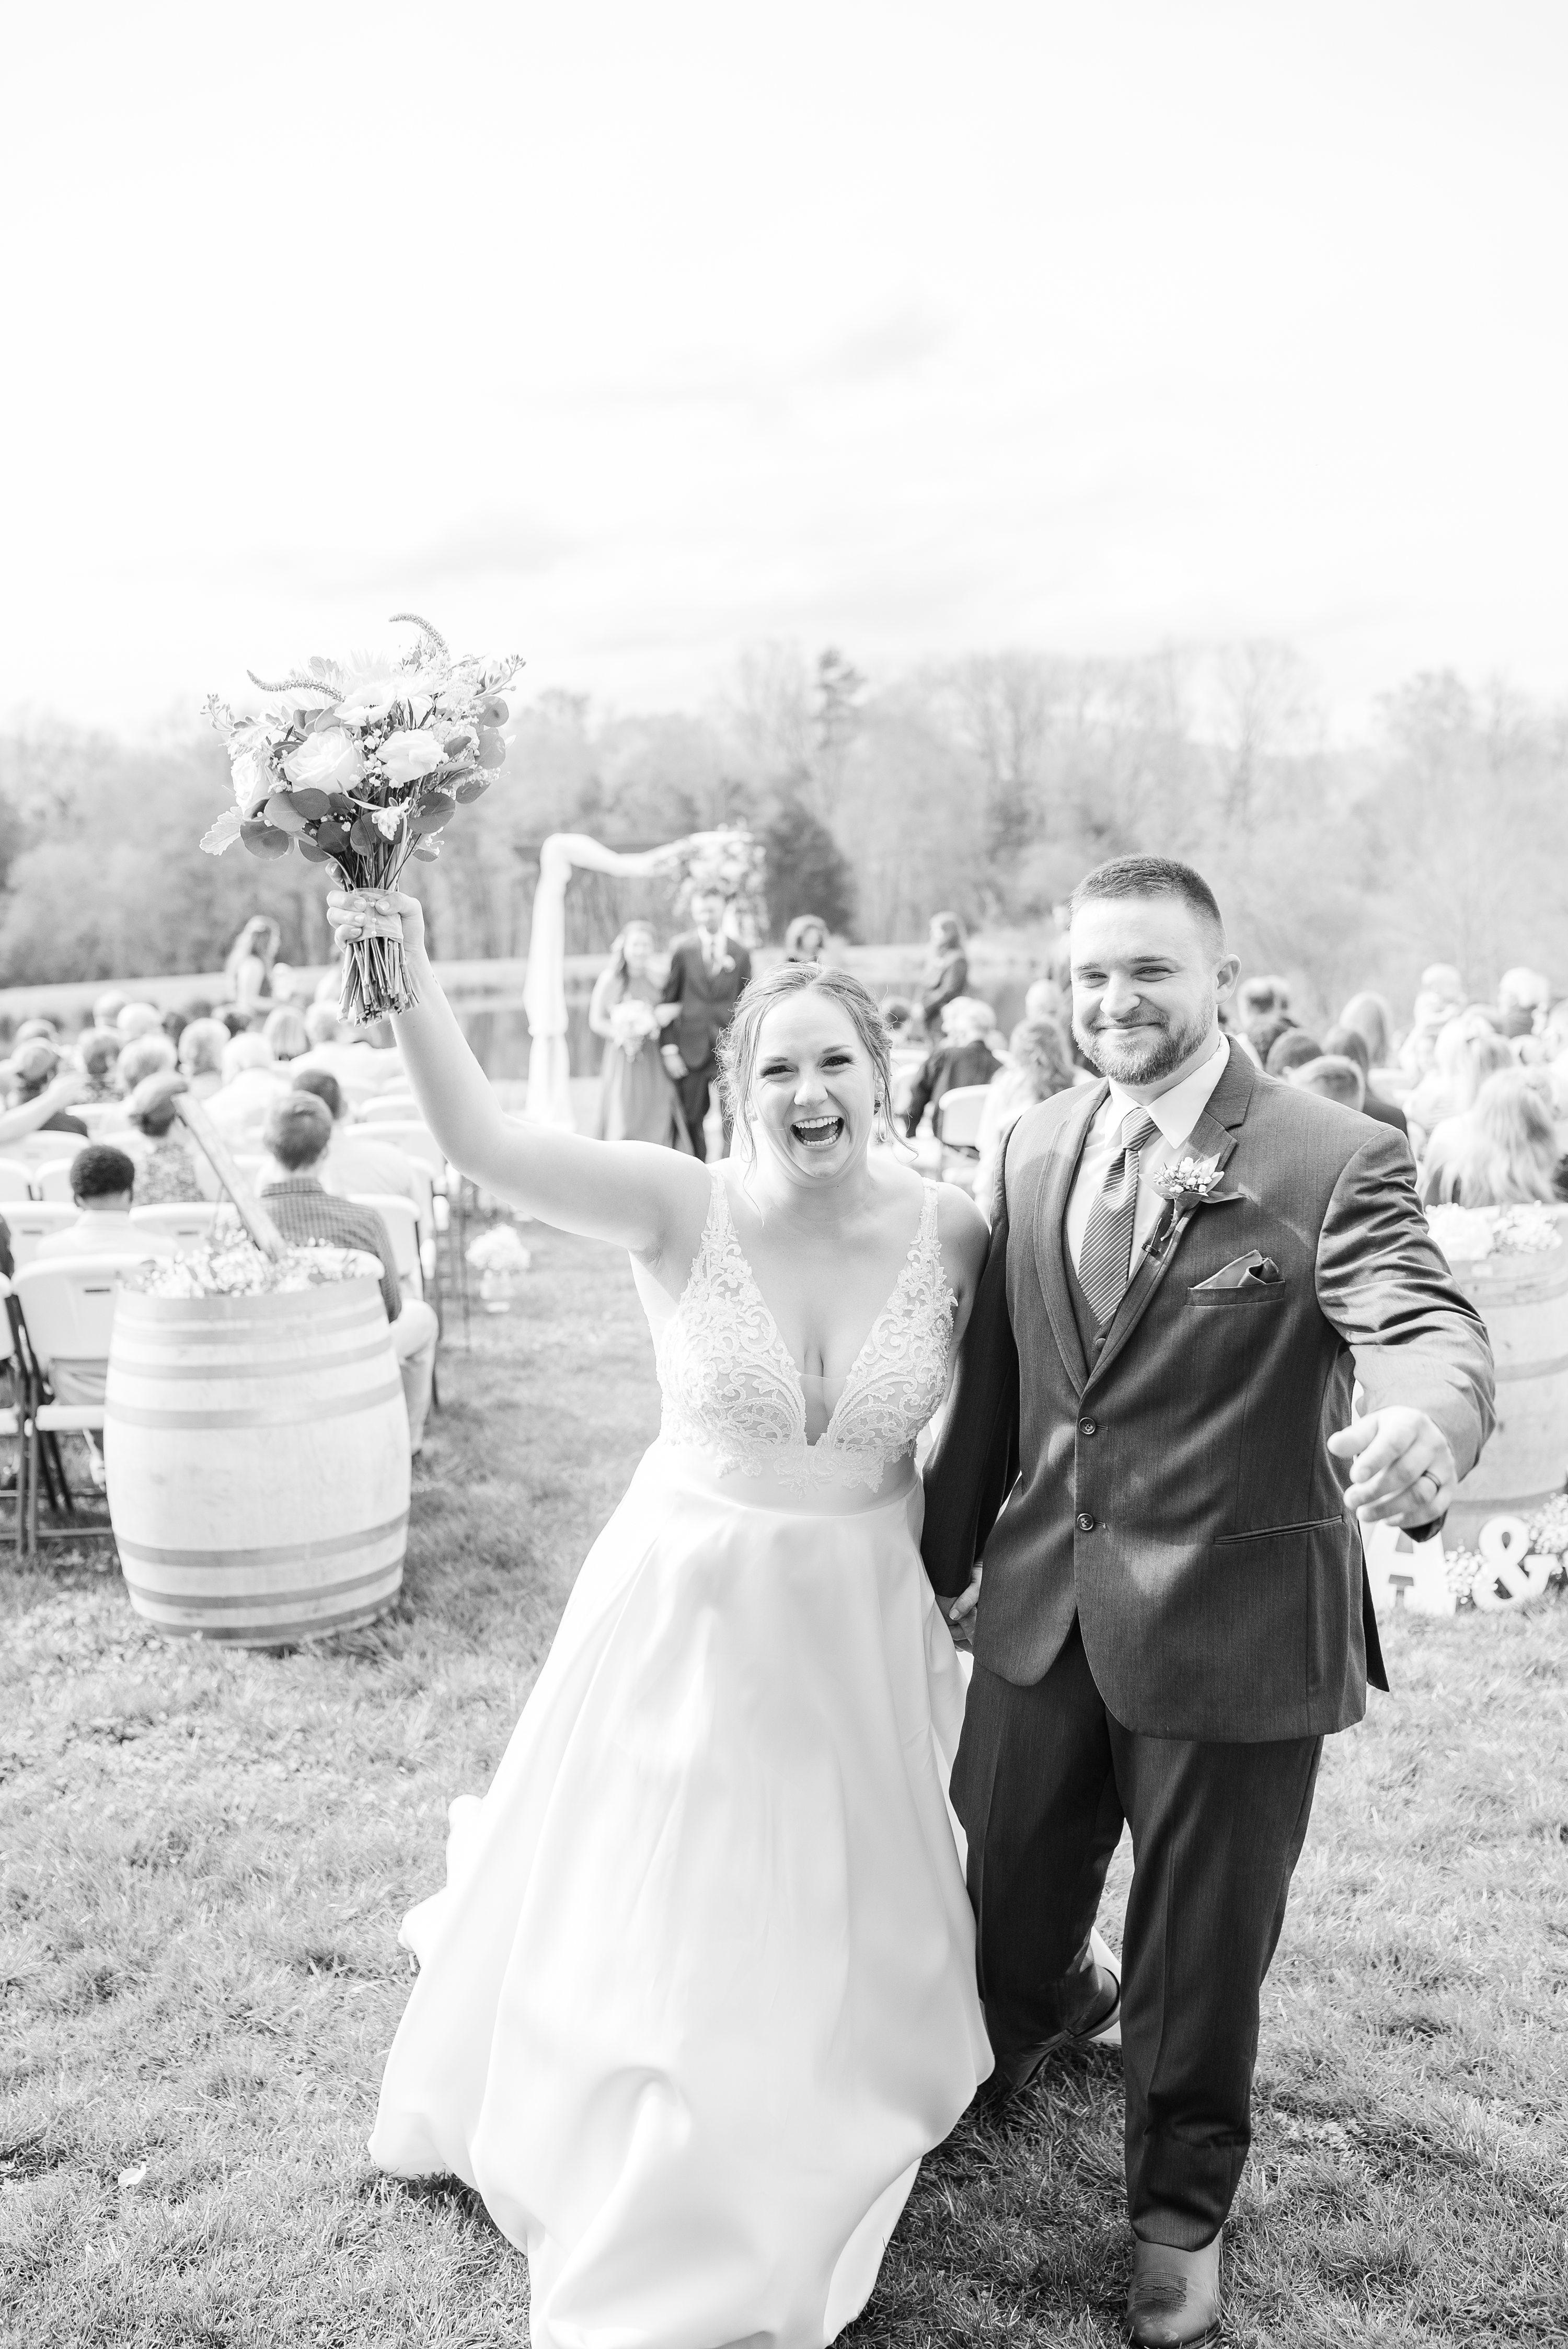 Edgewood,Blue Ridge Mountains,Barn at Edgewood,edgewood barn,bride and groom